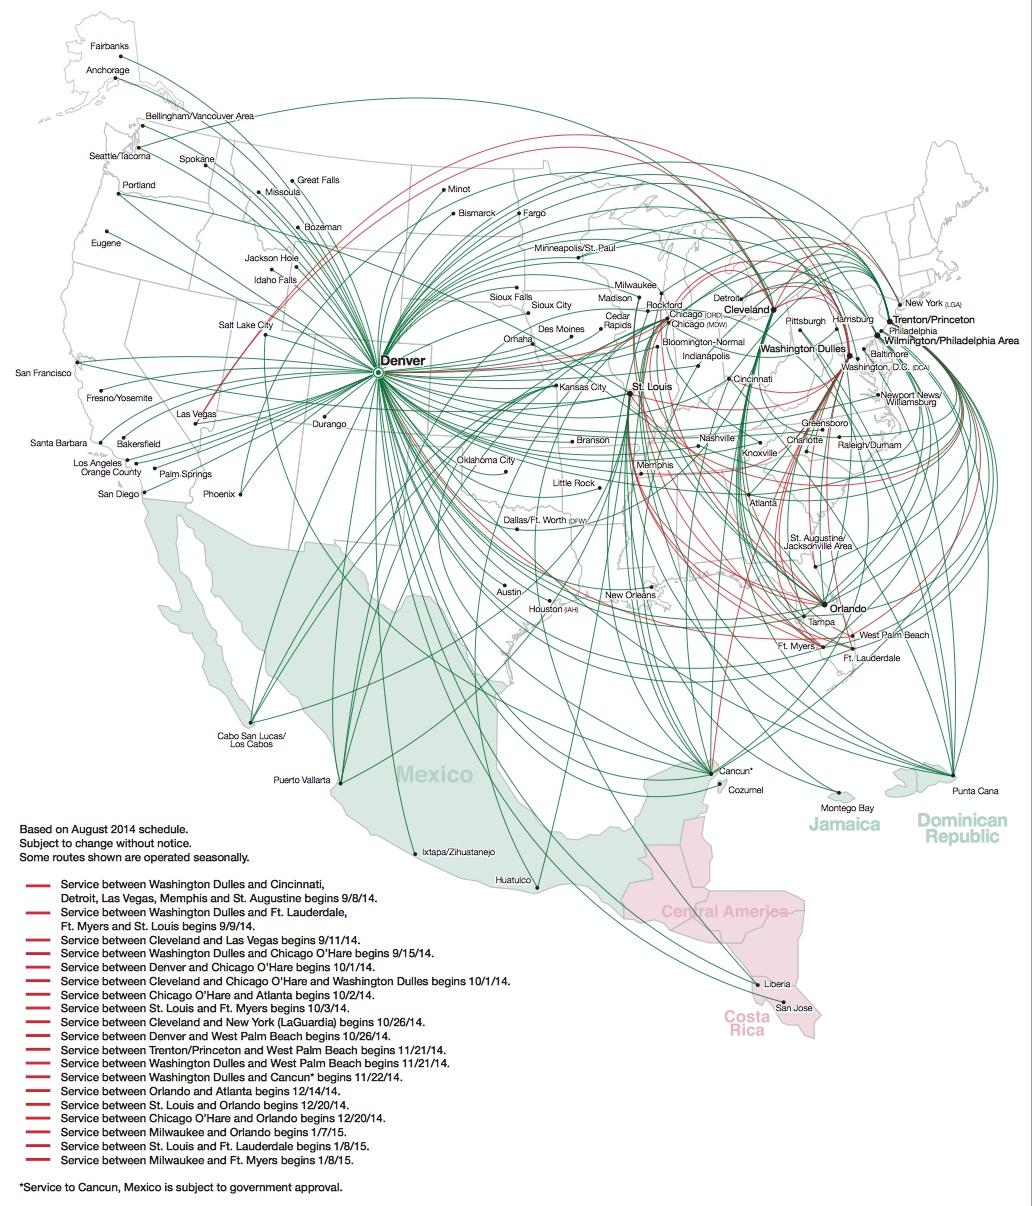 west palm beach | World Airline News